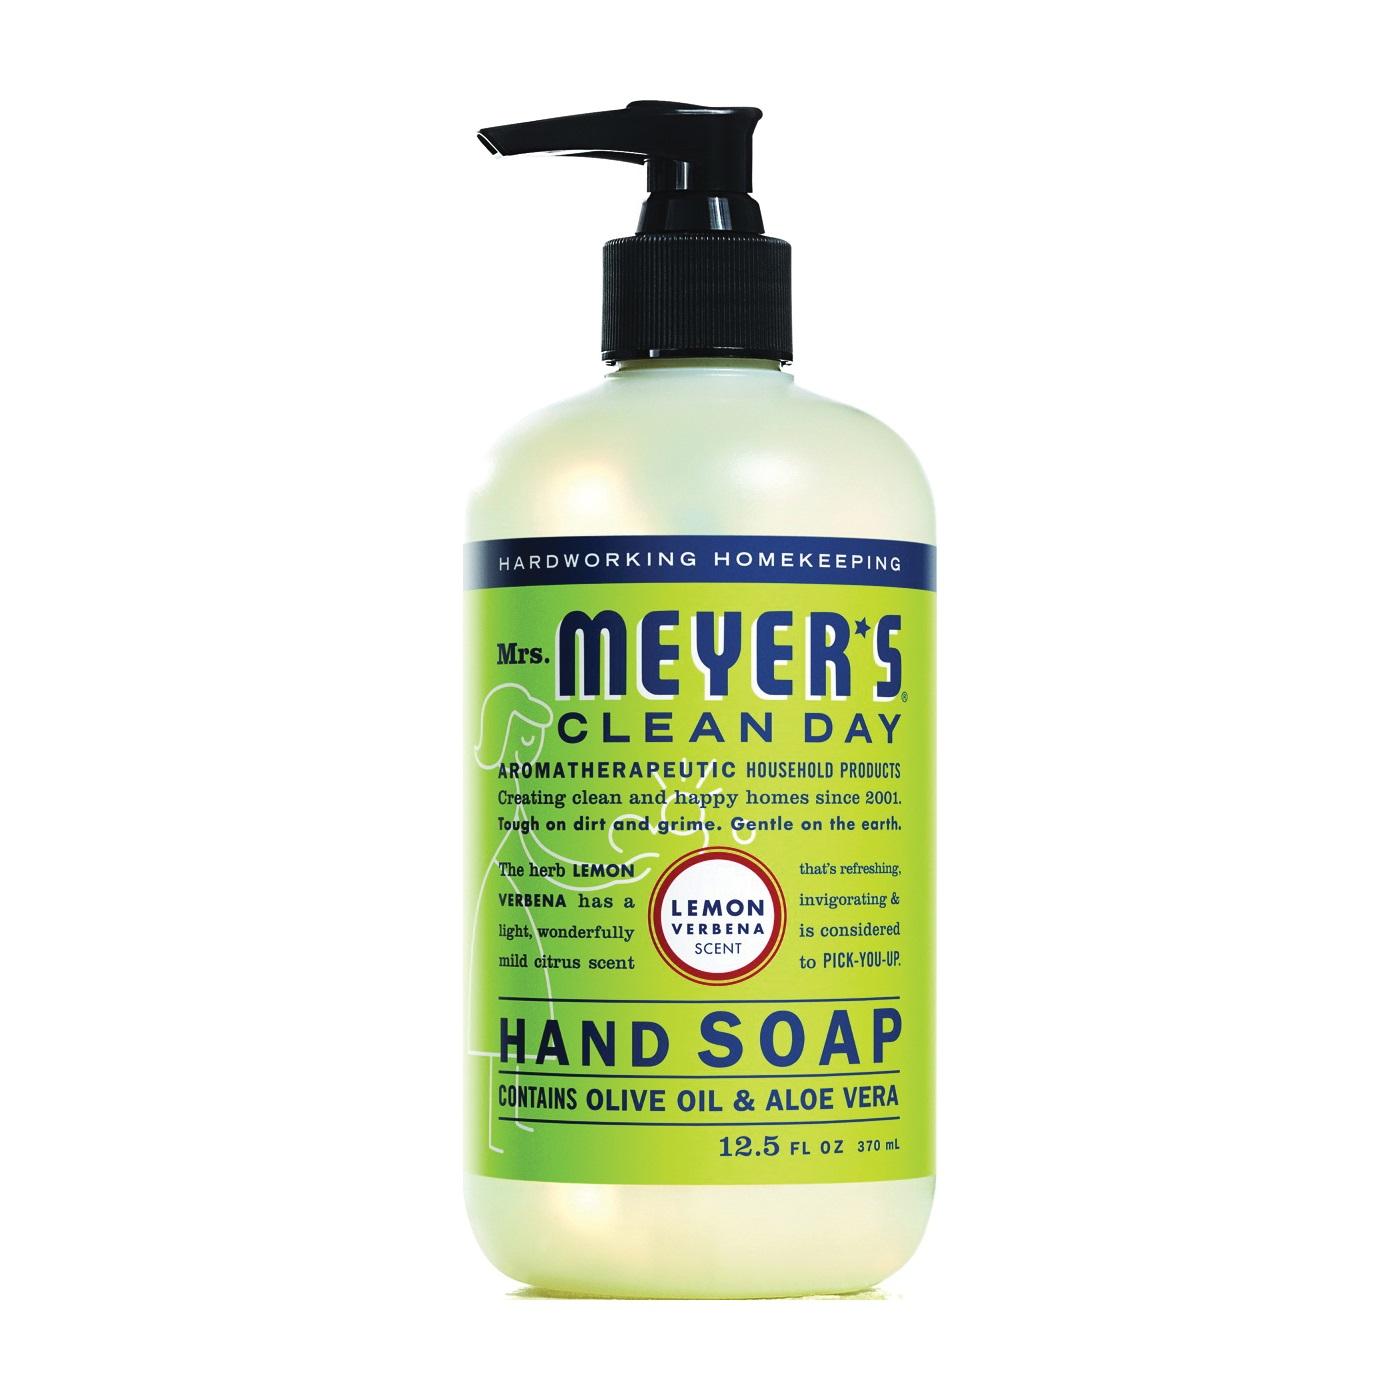 Picture of Mrs. Meyer's 12104 Hand Soap, Liquid, Lemon Verbena, 12.5 oz Package, Bottle